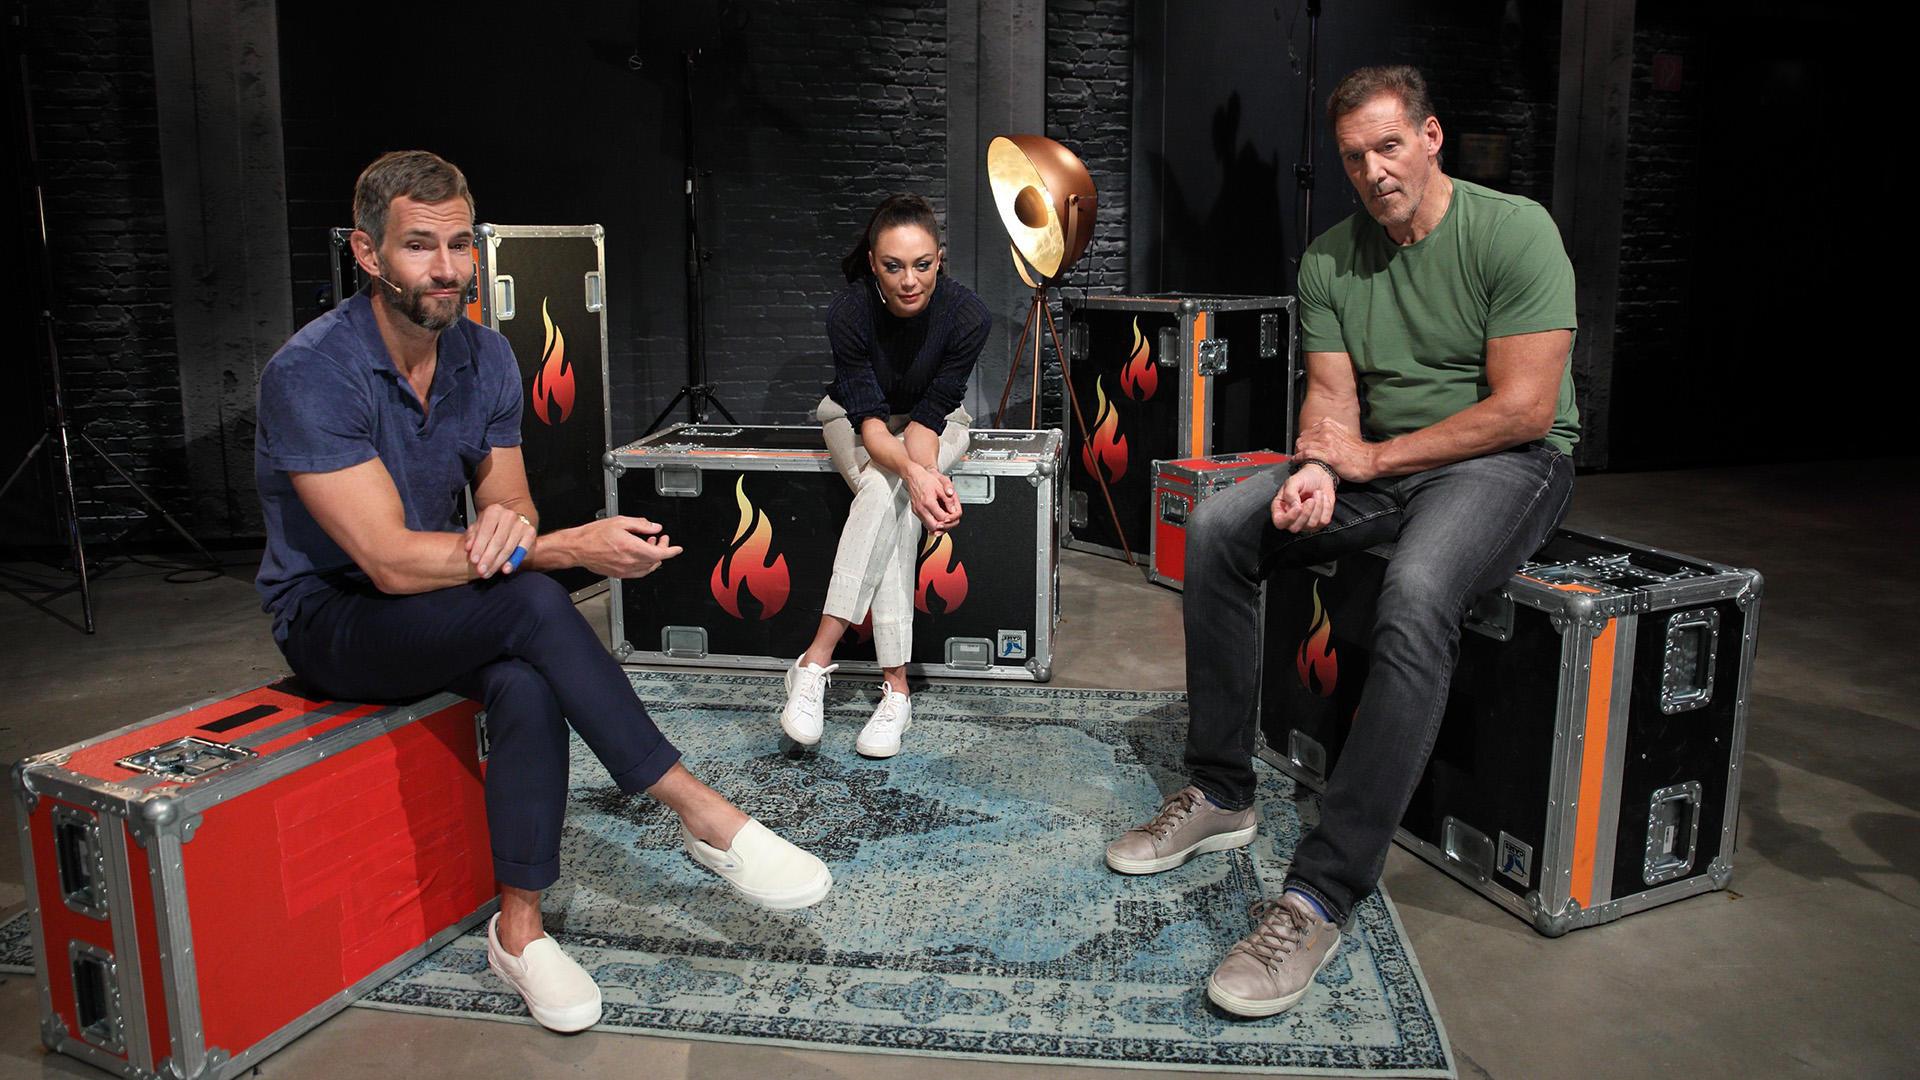 Gäste: Micky Beisenherz, Ralf Möller, Lilly Becker | Folge 12